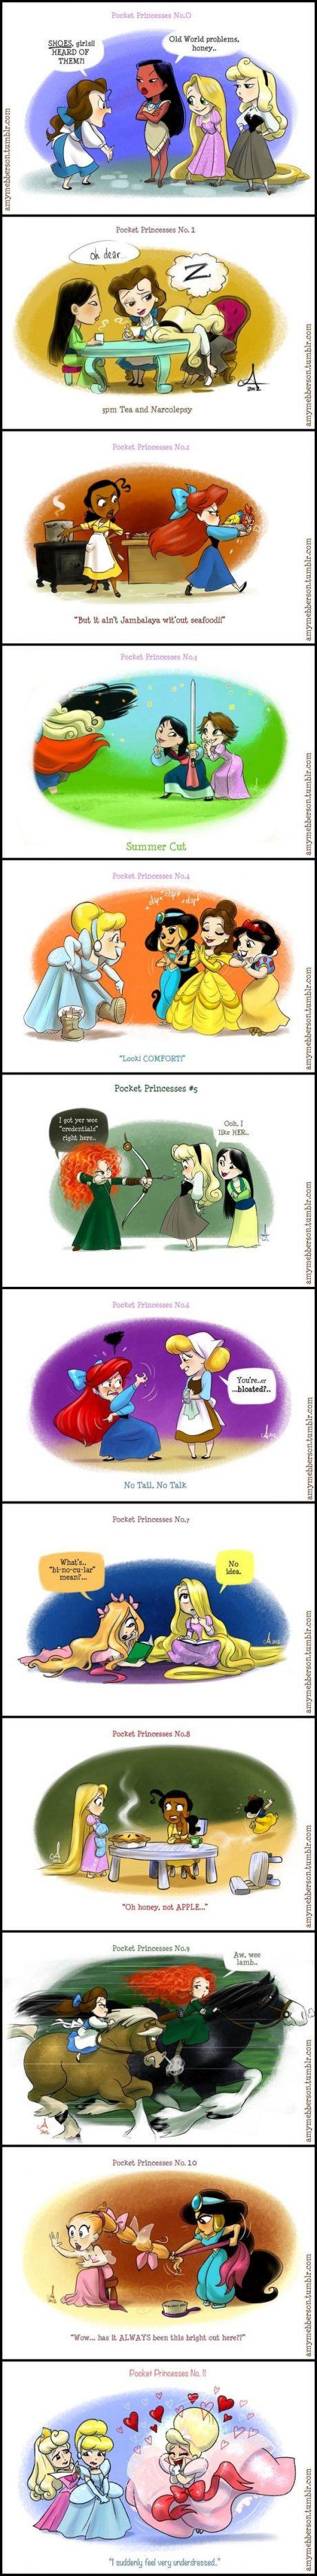 Pocket Princesses (Part by Amy Mebberson Don't consider Brave Disney but. Pocket Princesses, Pocket Princess Comics, Disney Pixar, Disney And Dreamworks, Disney Magic, Walt Disney, Disney Princess Memes, Disney Jokes, Funny Disney Memes